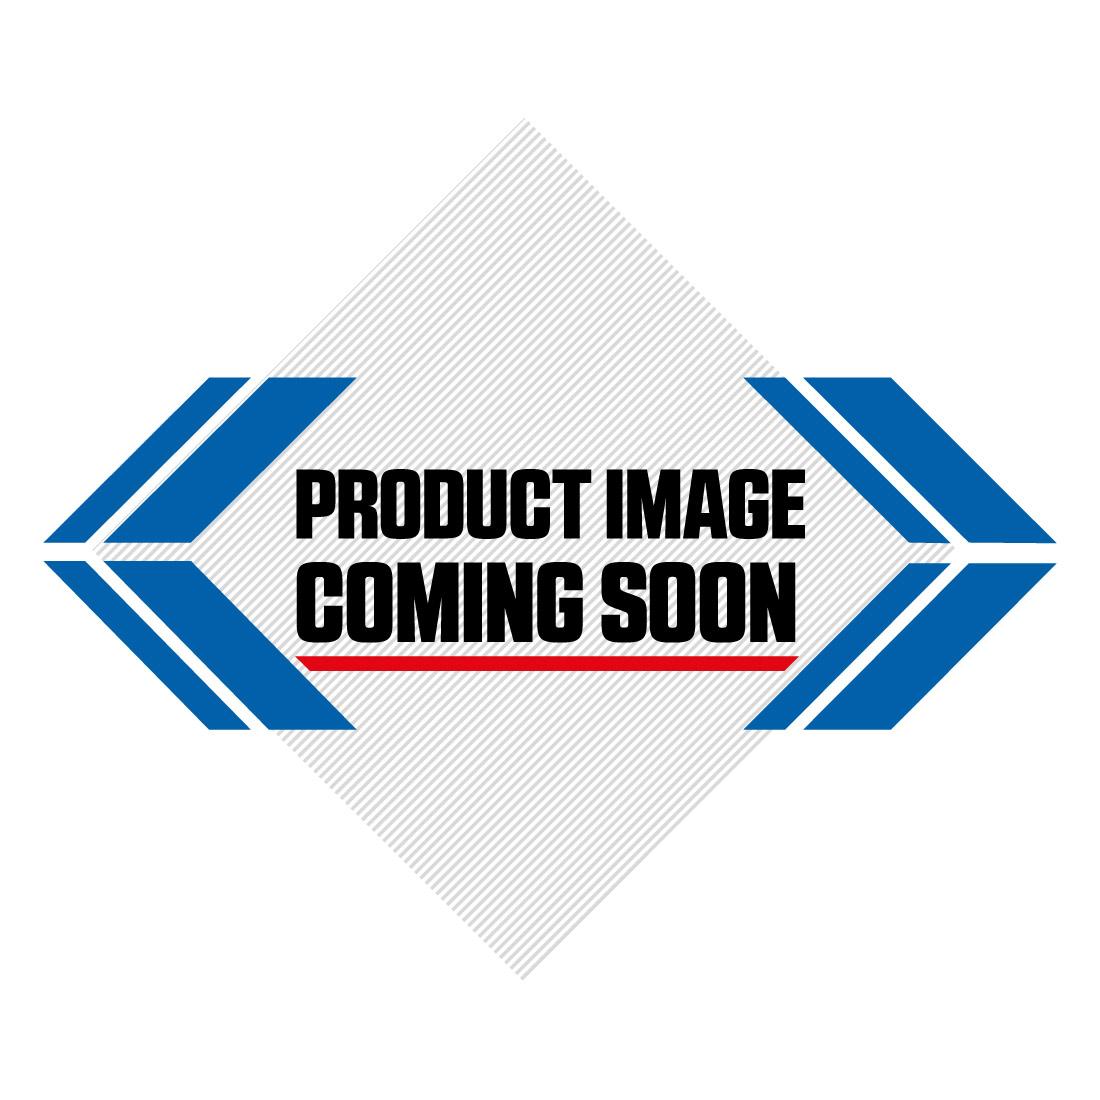 2019 UFO Interceptor 2 Helmet - Galaxy Limited Edition Image-2